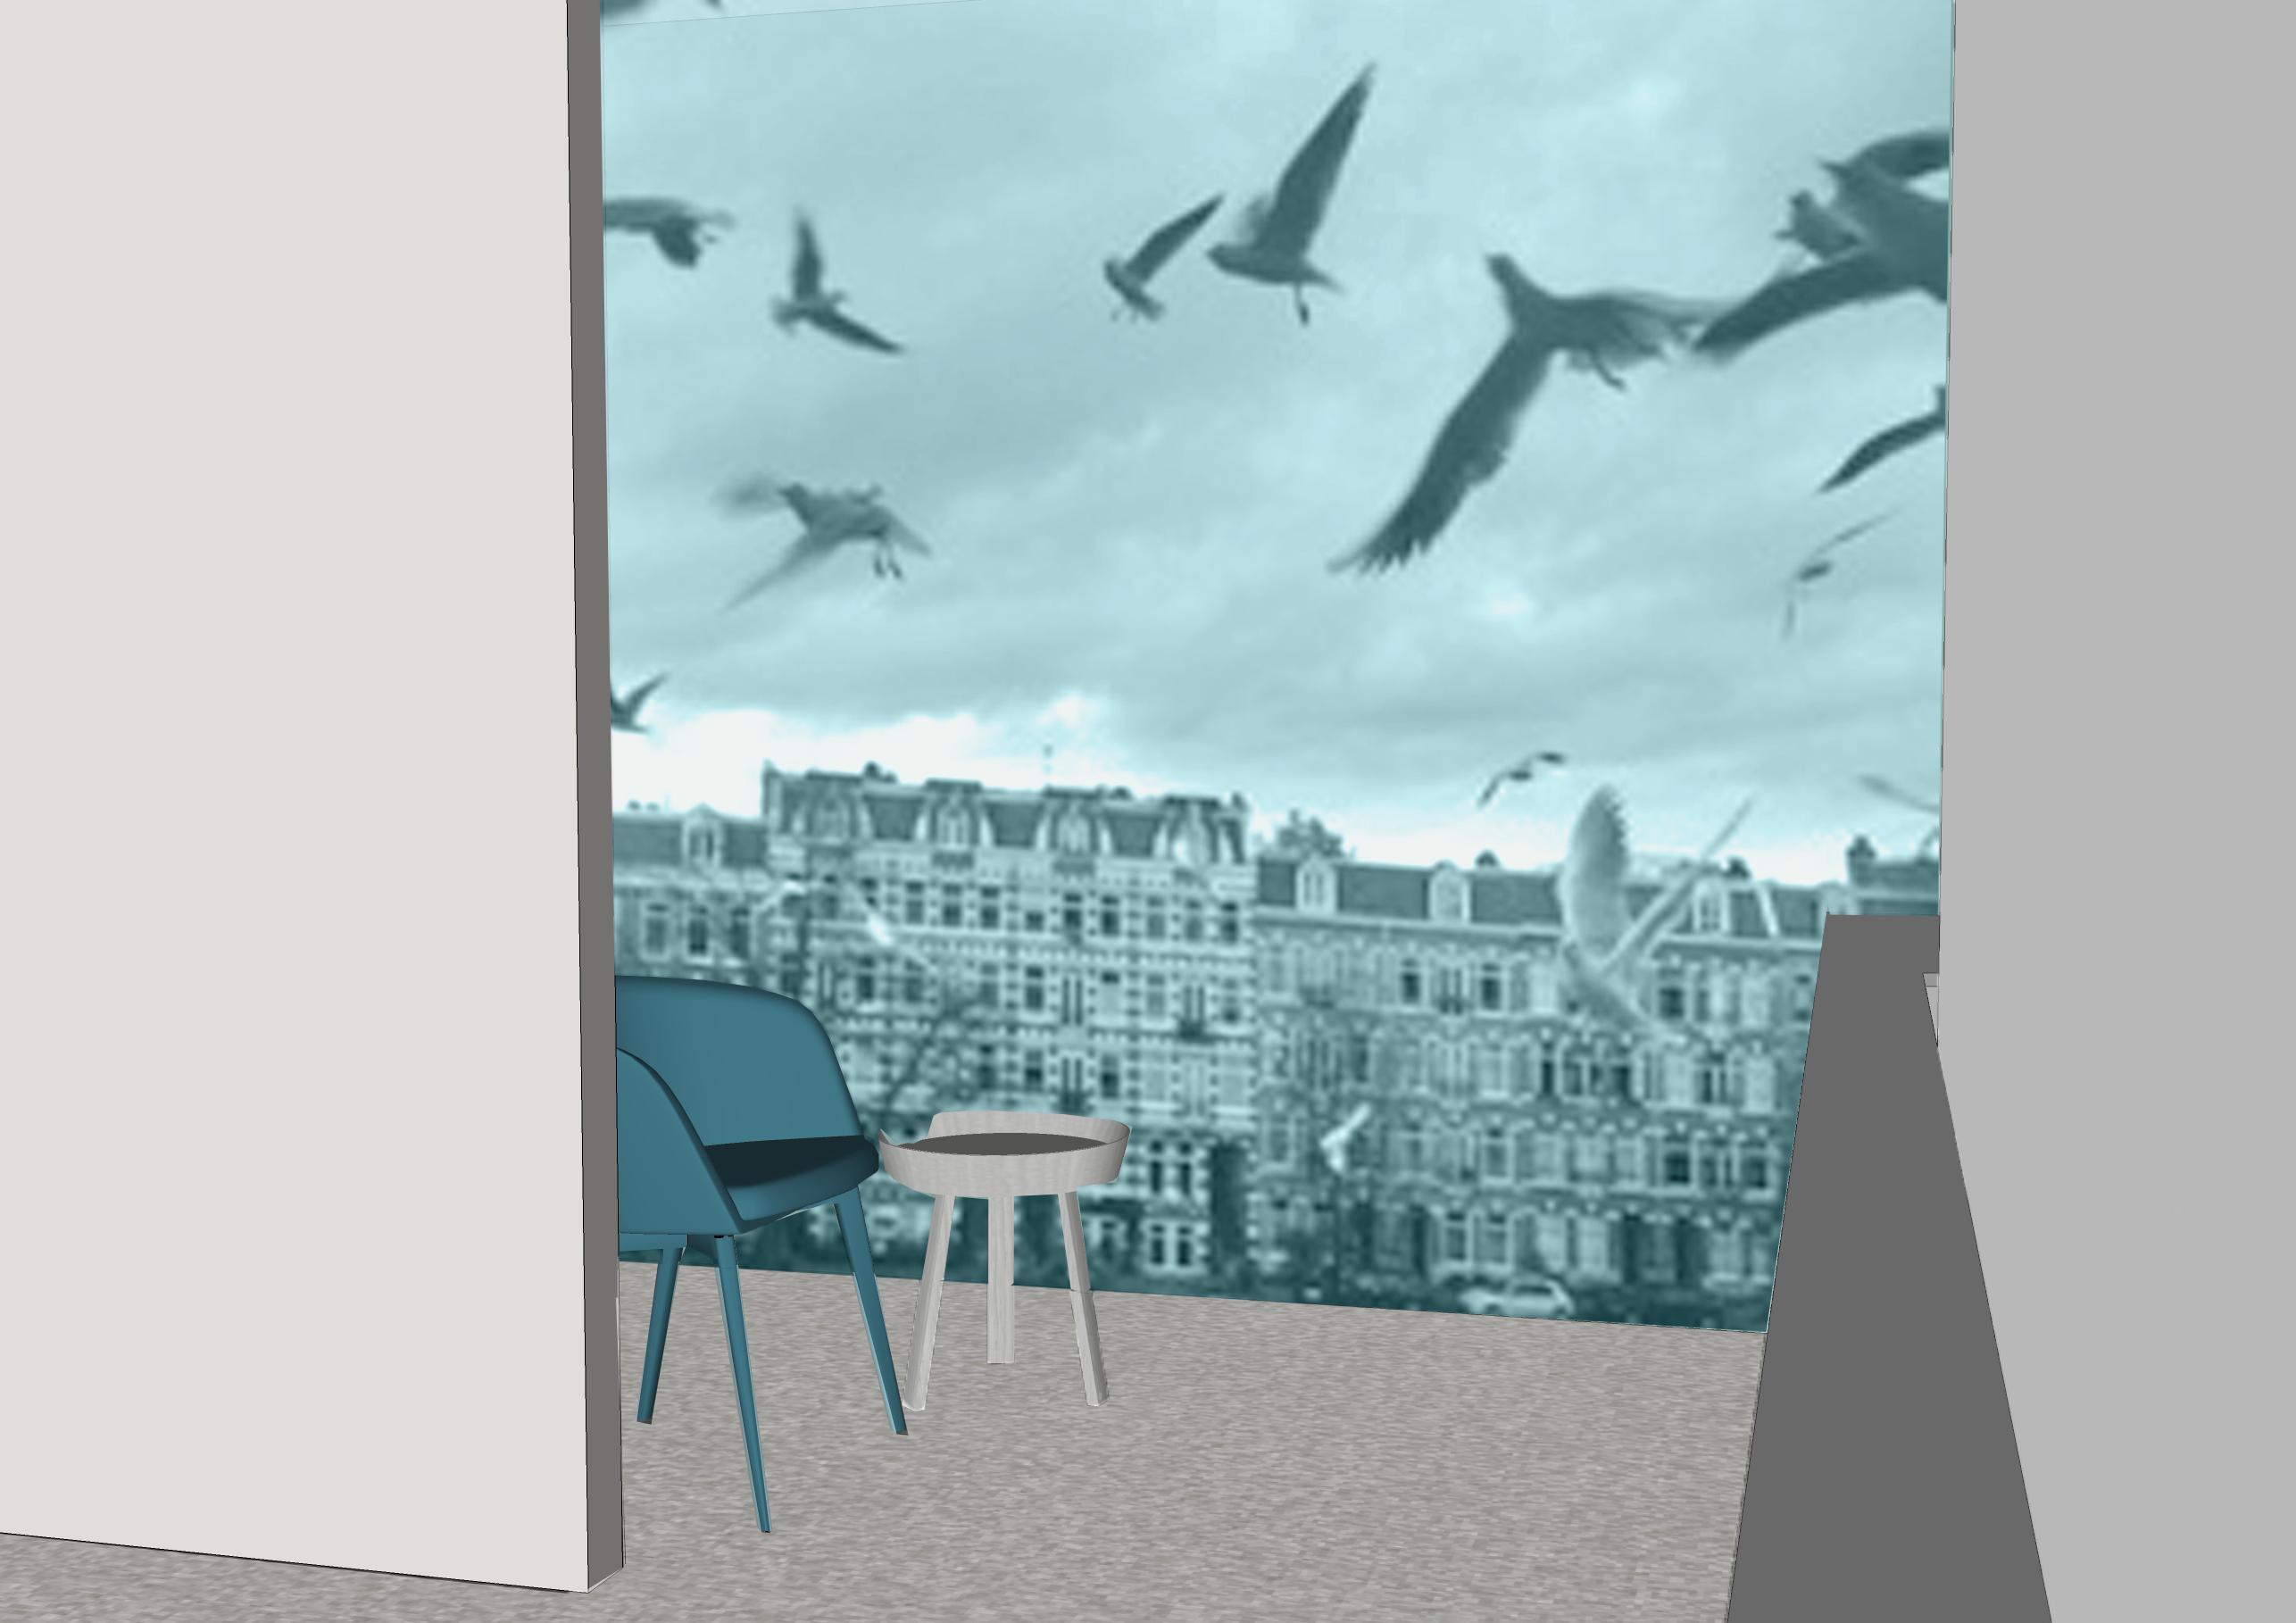 3e etage_belkamer blauw2